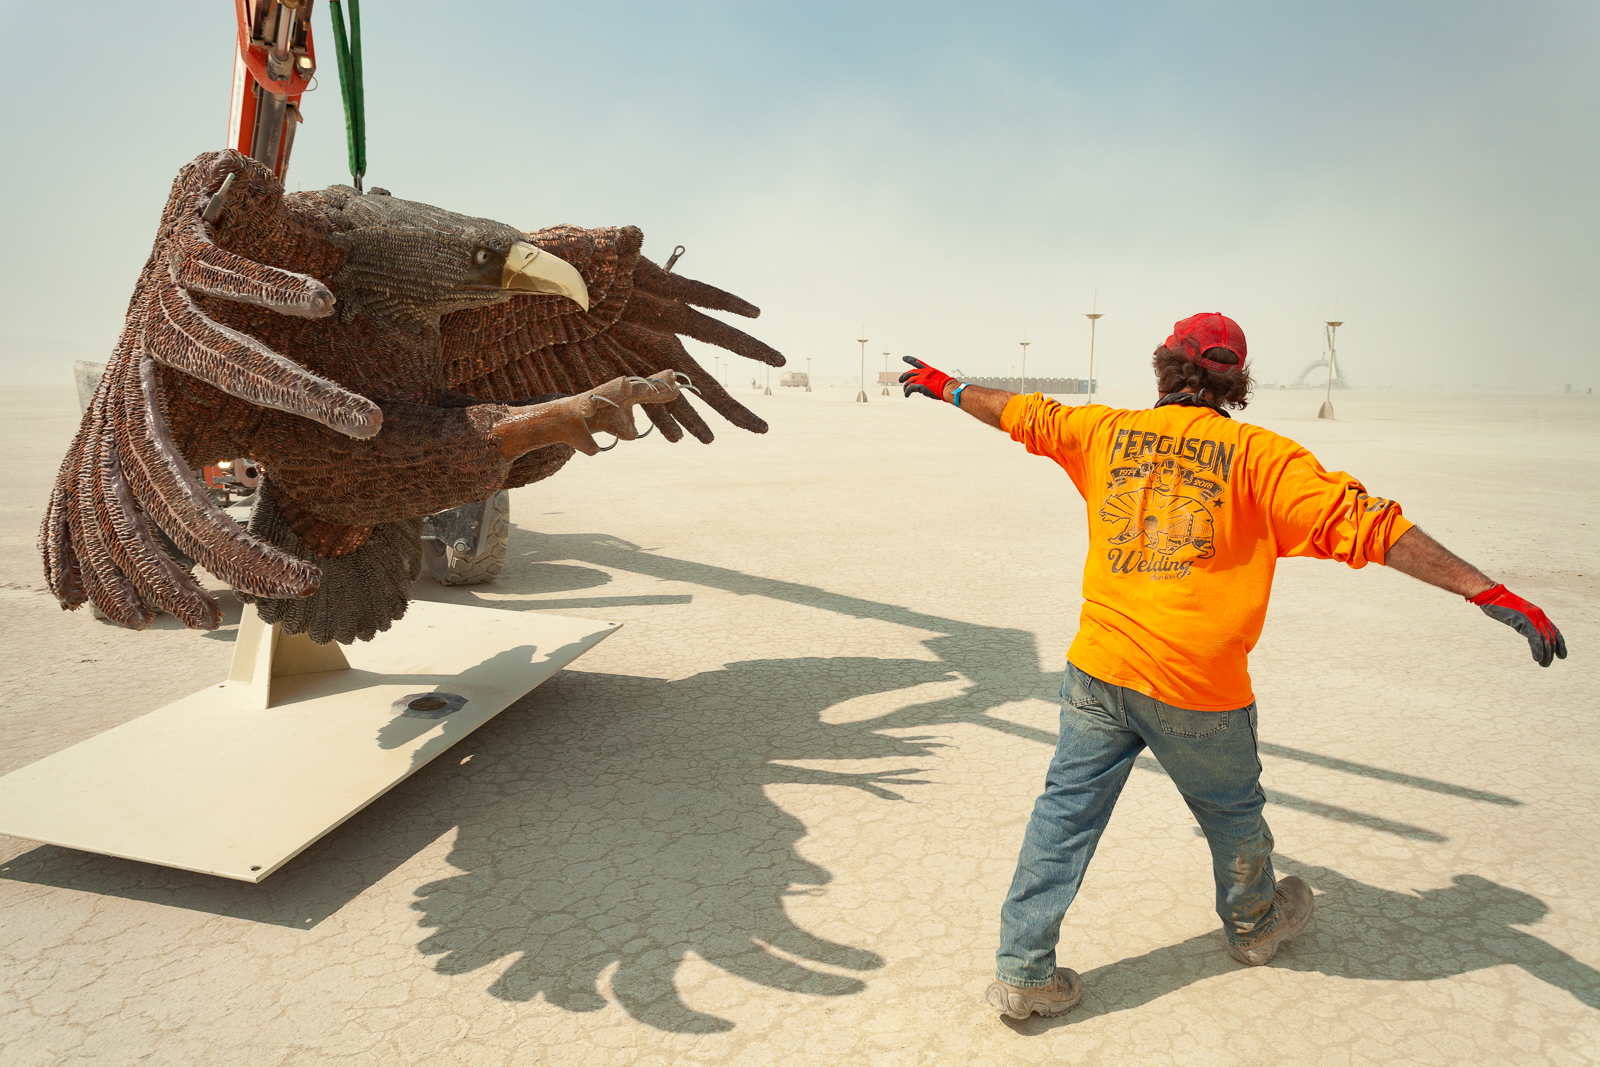 Loading onto Playa for Burning Man